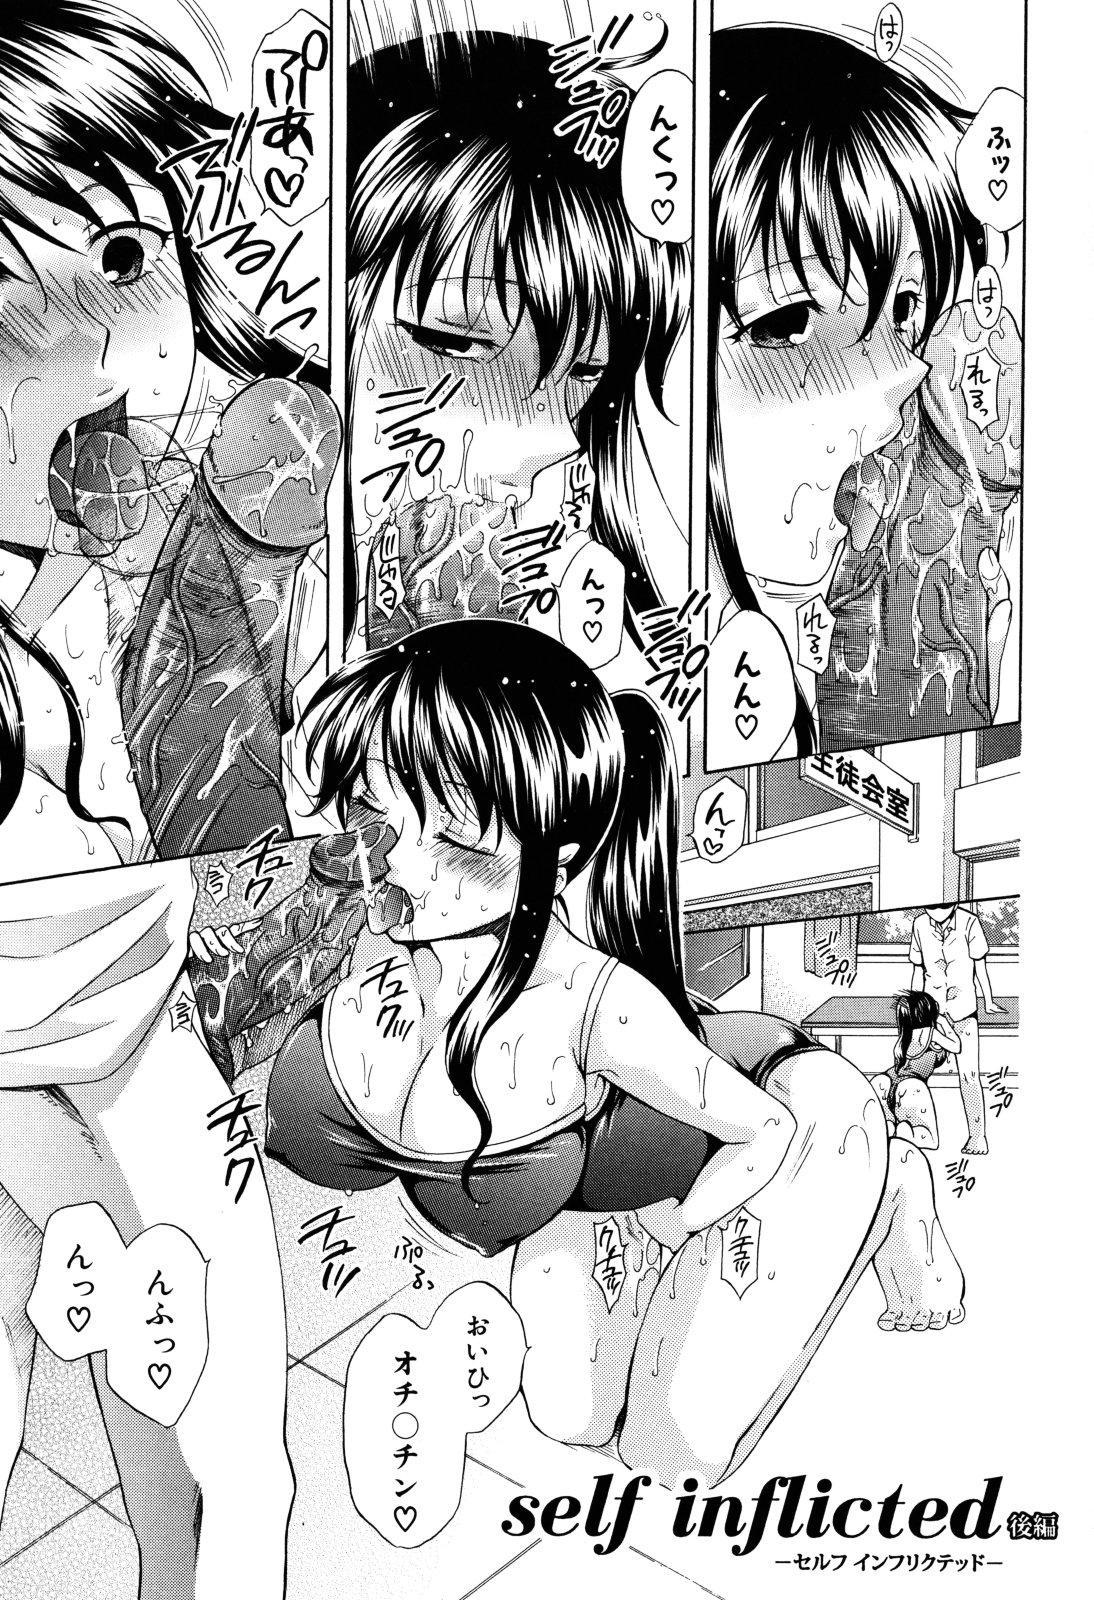 Kanojo ga Ochiru made - She in the depth 202